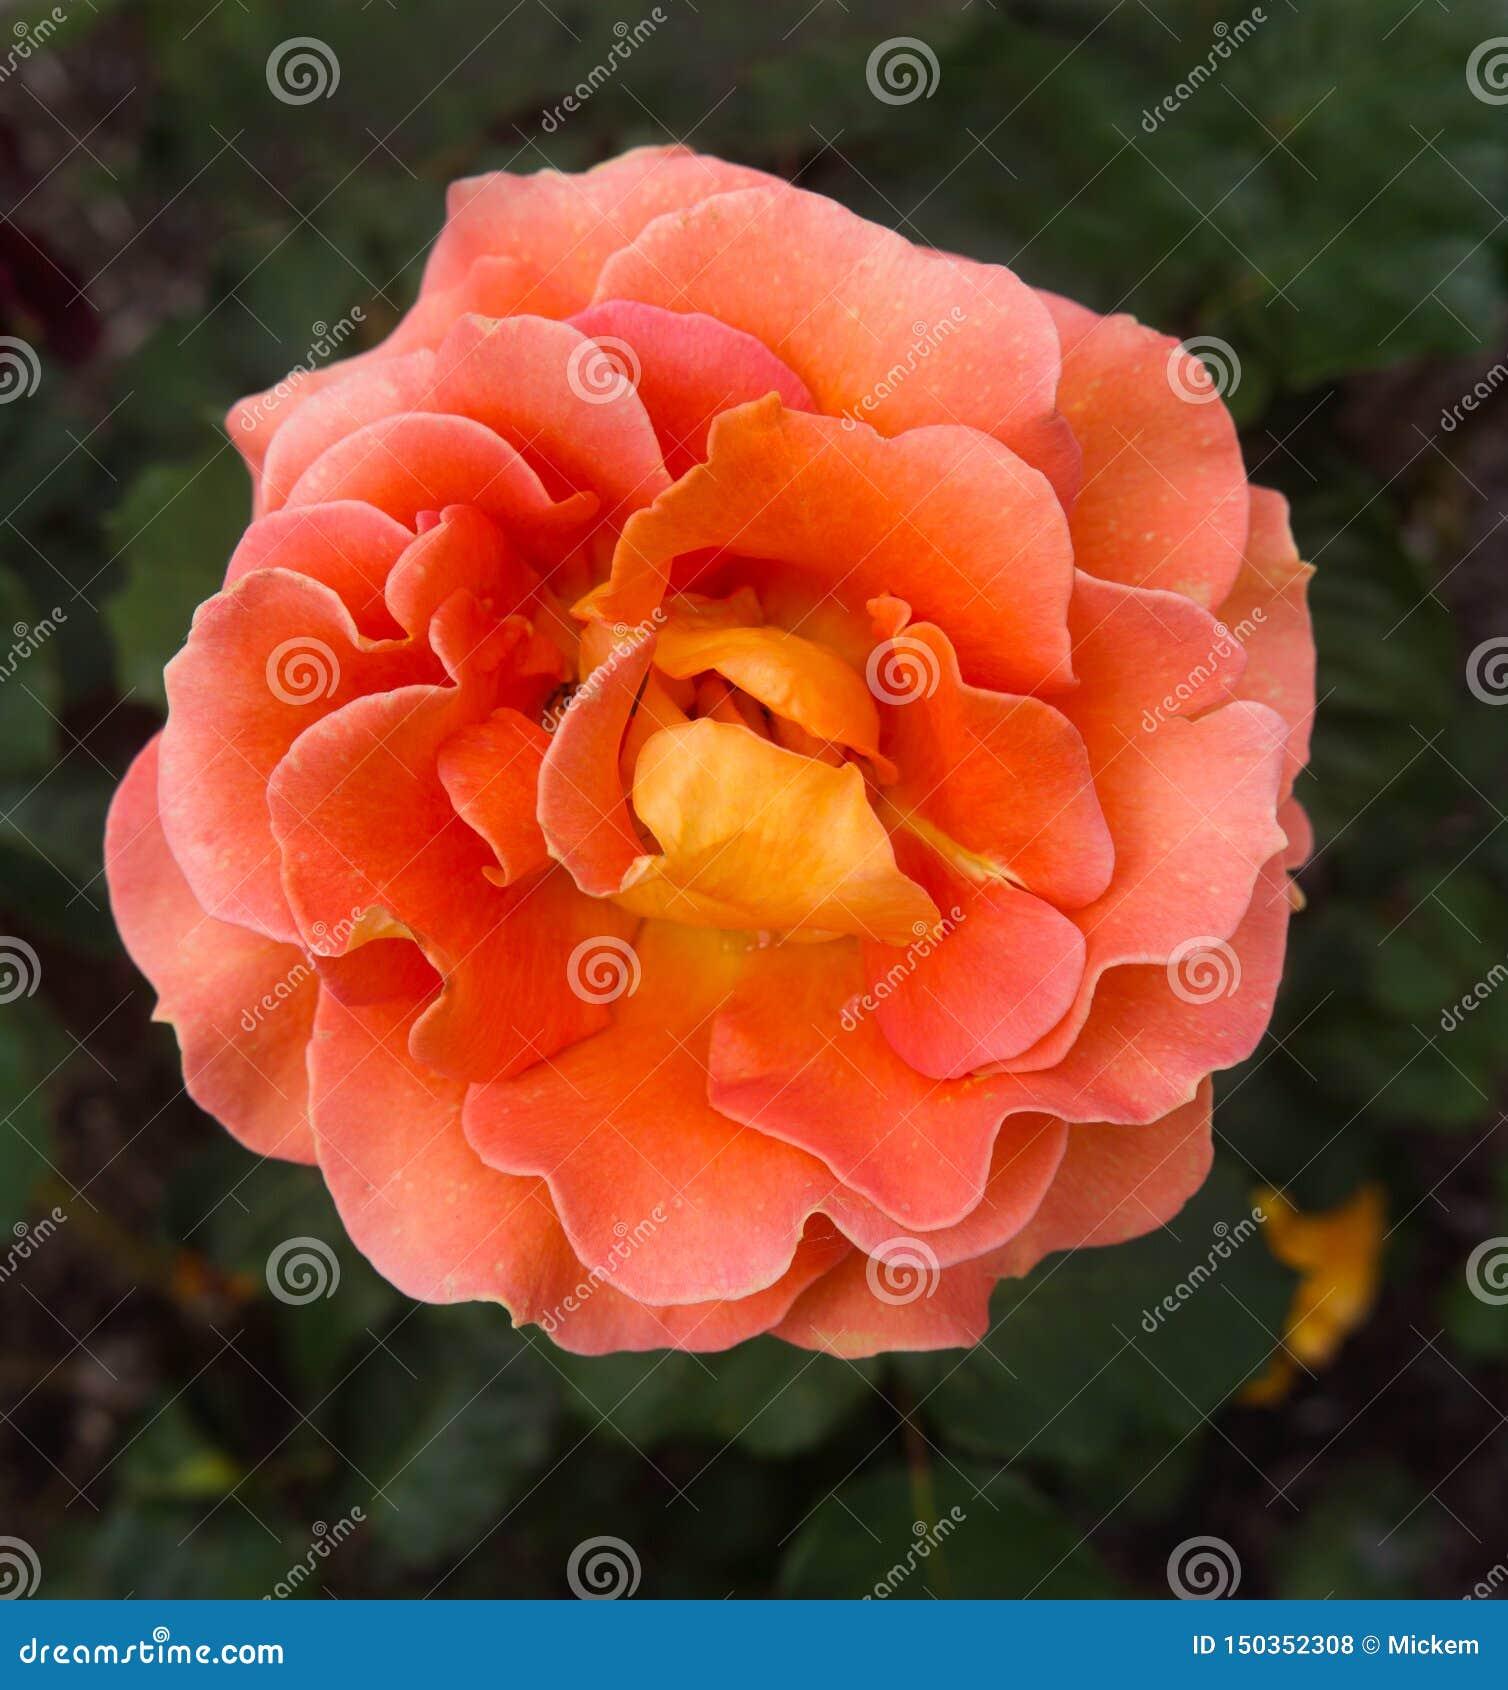 Blooming Single Orange Rose in garden blurred background